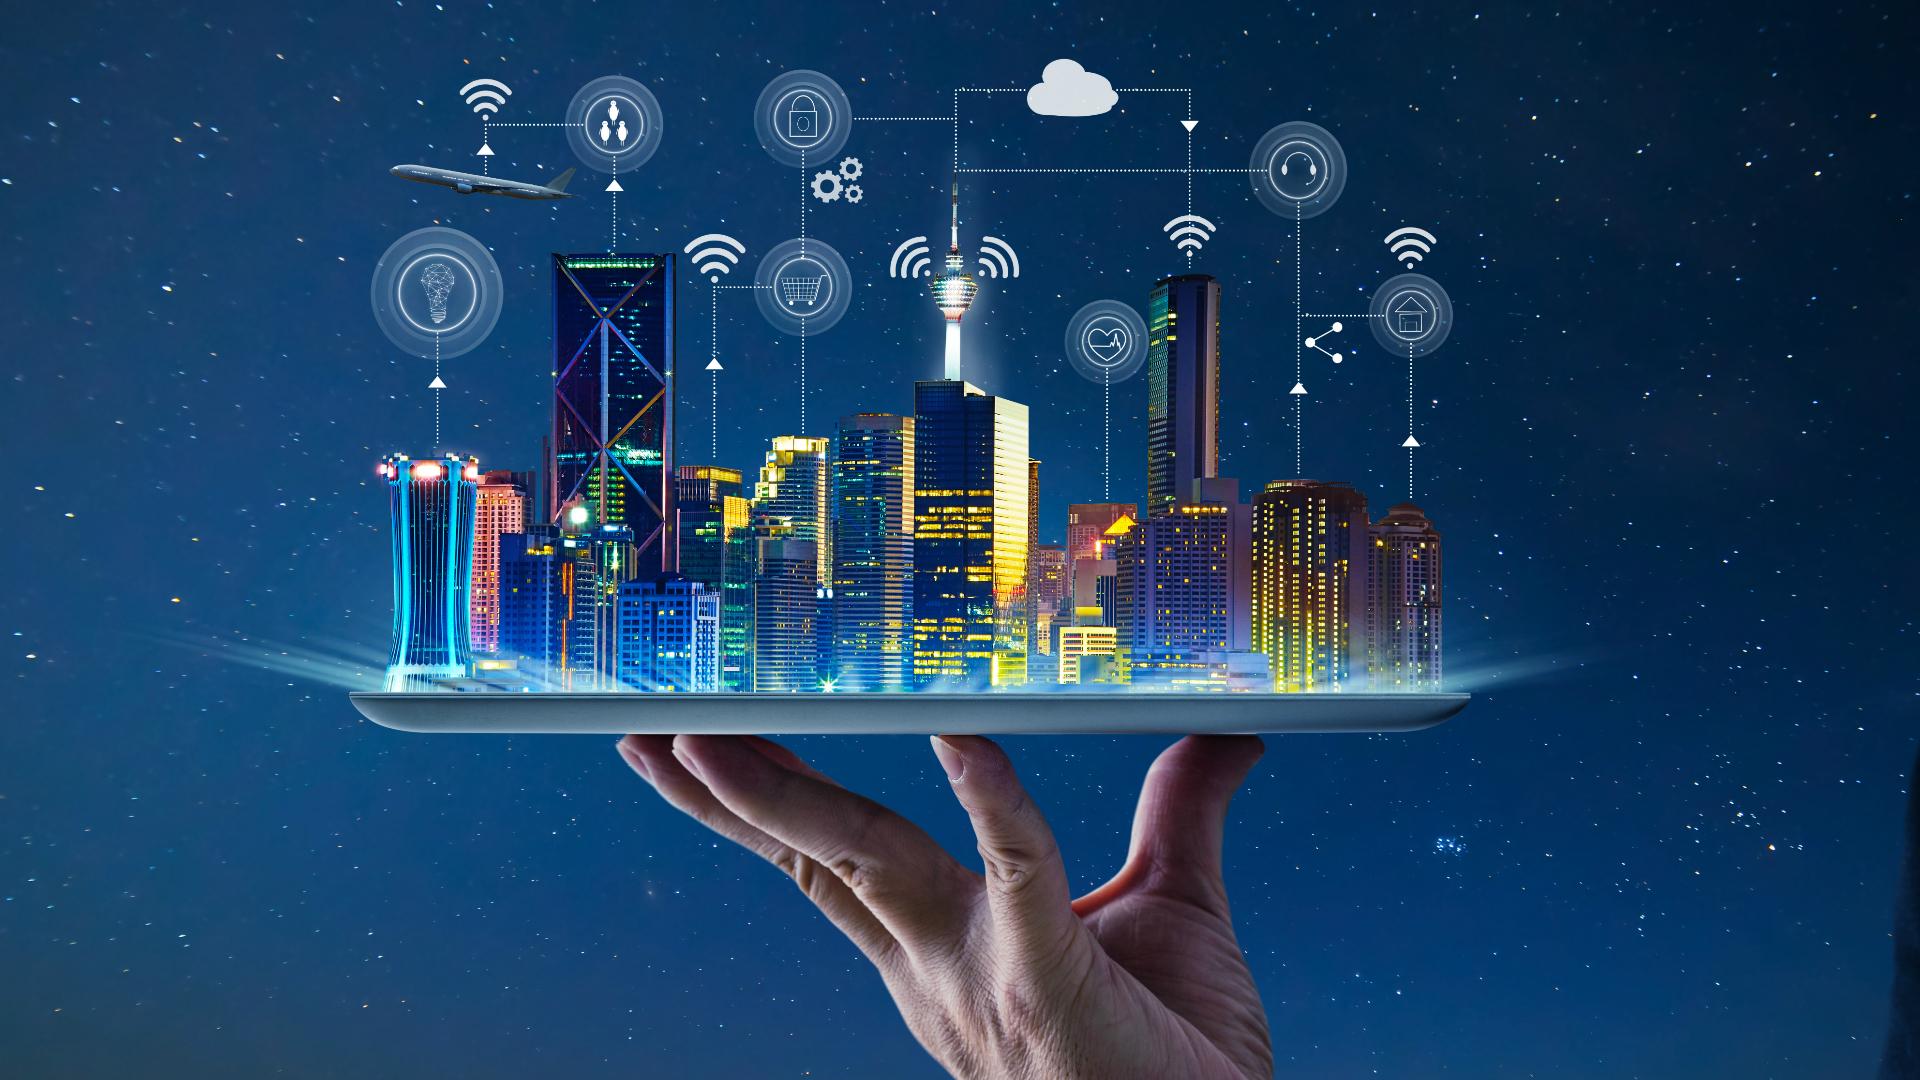 Digital Transformation Challenges Part 1 Introduction And Overview The Digital Transformation People